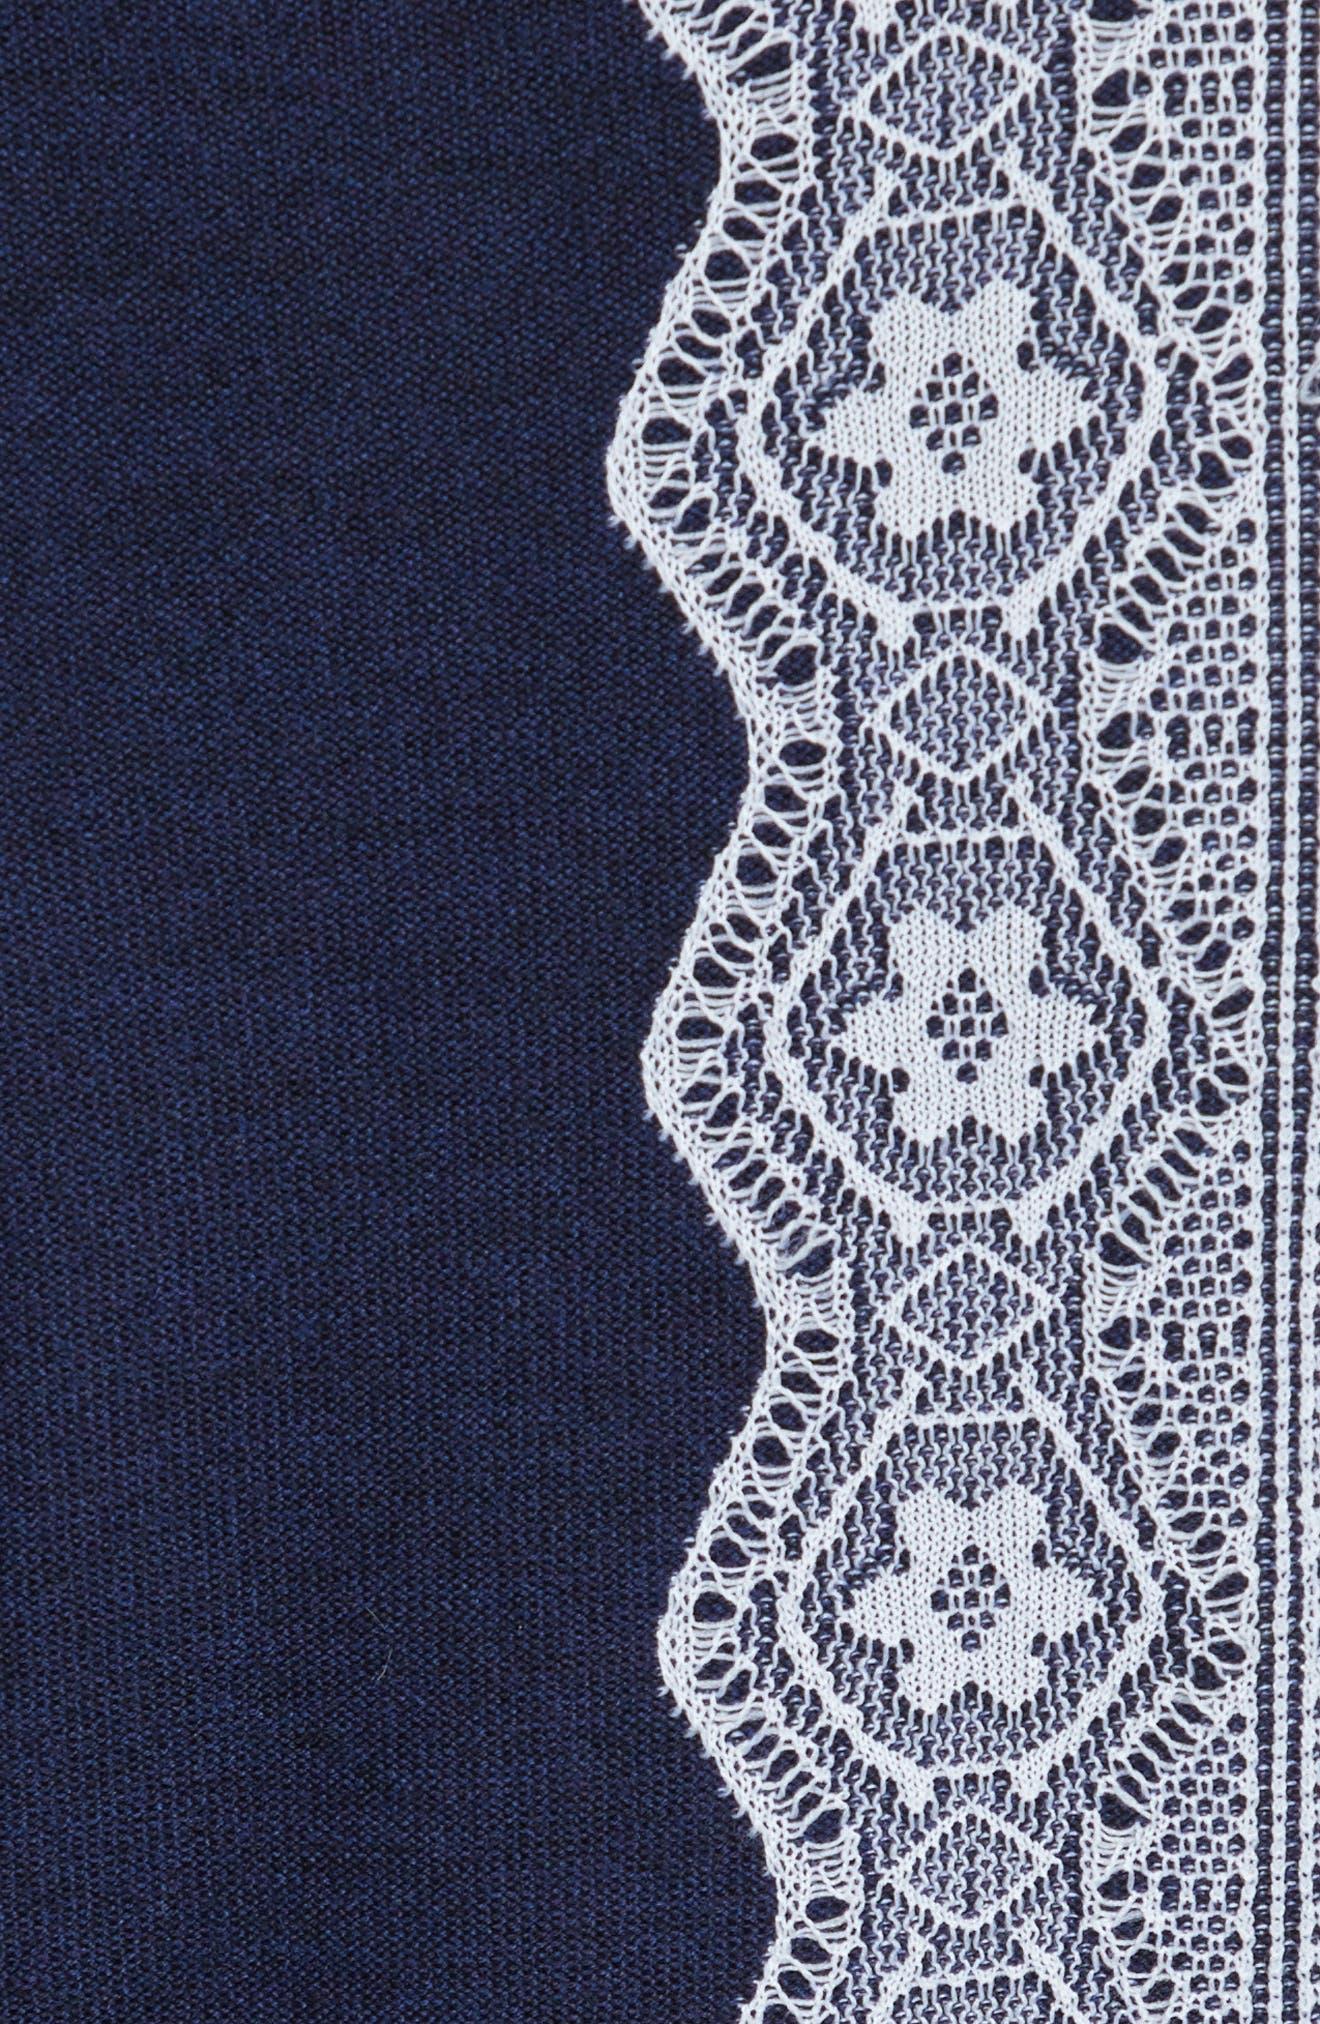 Intarsia Lace Wool Blend Dress,                             Alternate thumbnail 5, color,                             Navy Melange